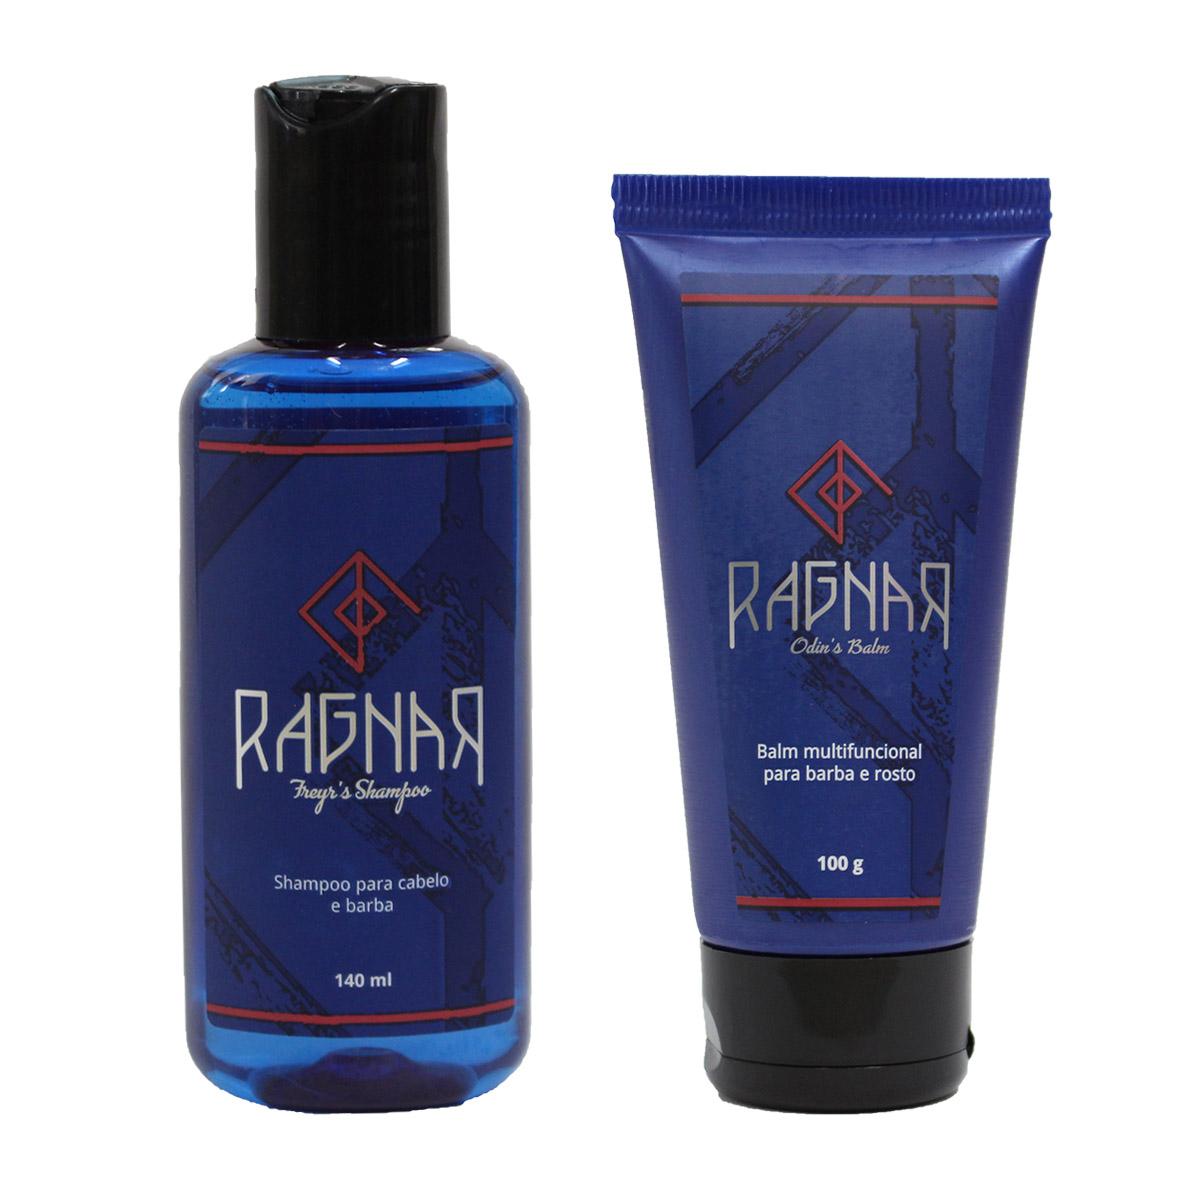 Shampoo para Cabelo e Barba 140 ml (Freyr's Shampoo) + Balm Multifuncional para Barba e Rosto 100 g (Odin's Balm)